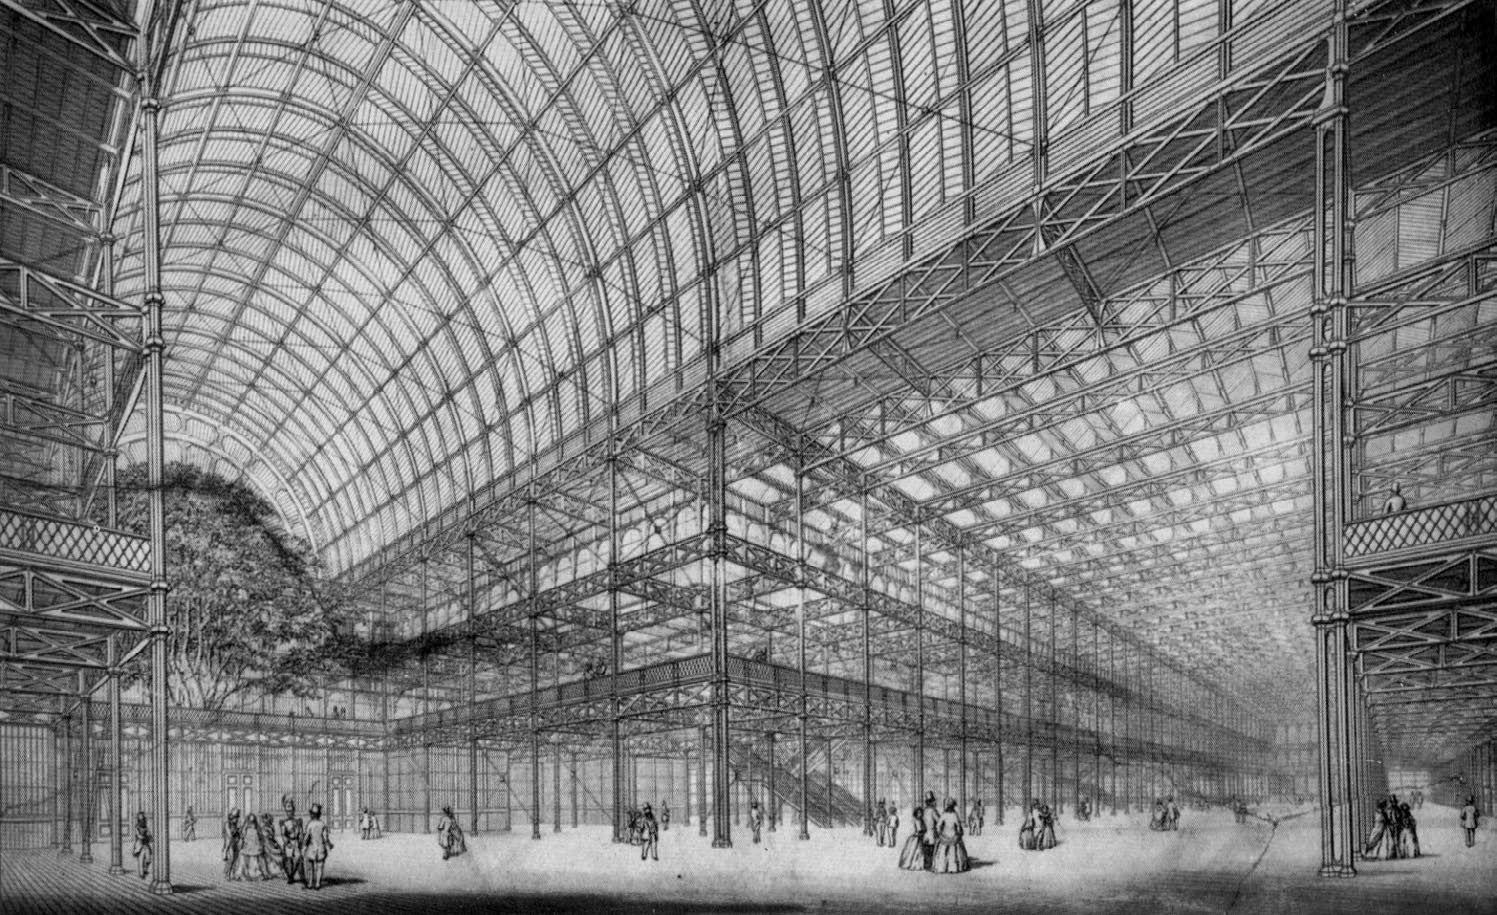 Crystal Palace Joseph Paxton. London, England 1851